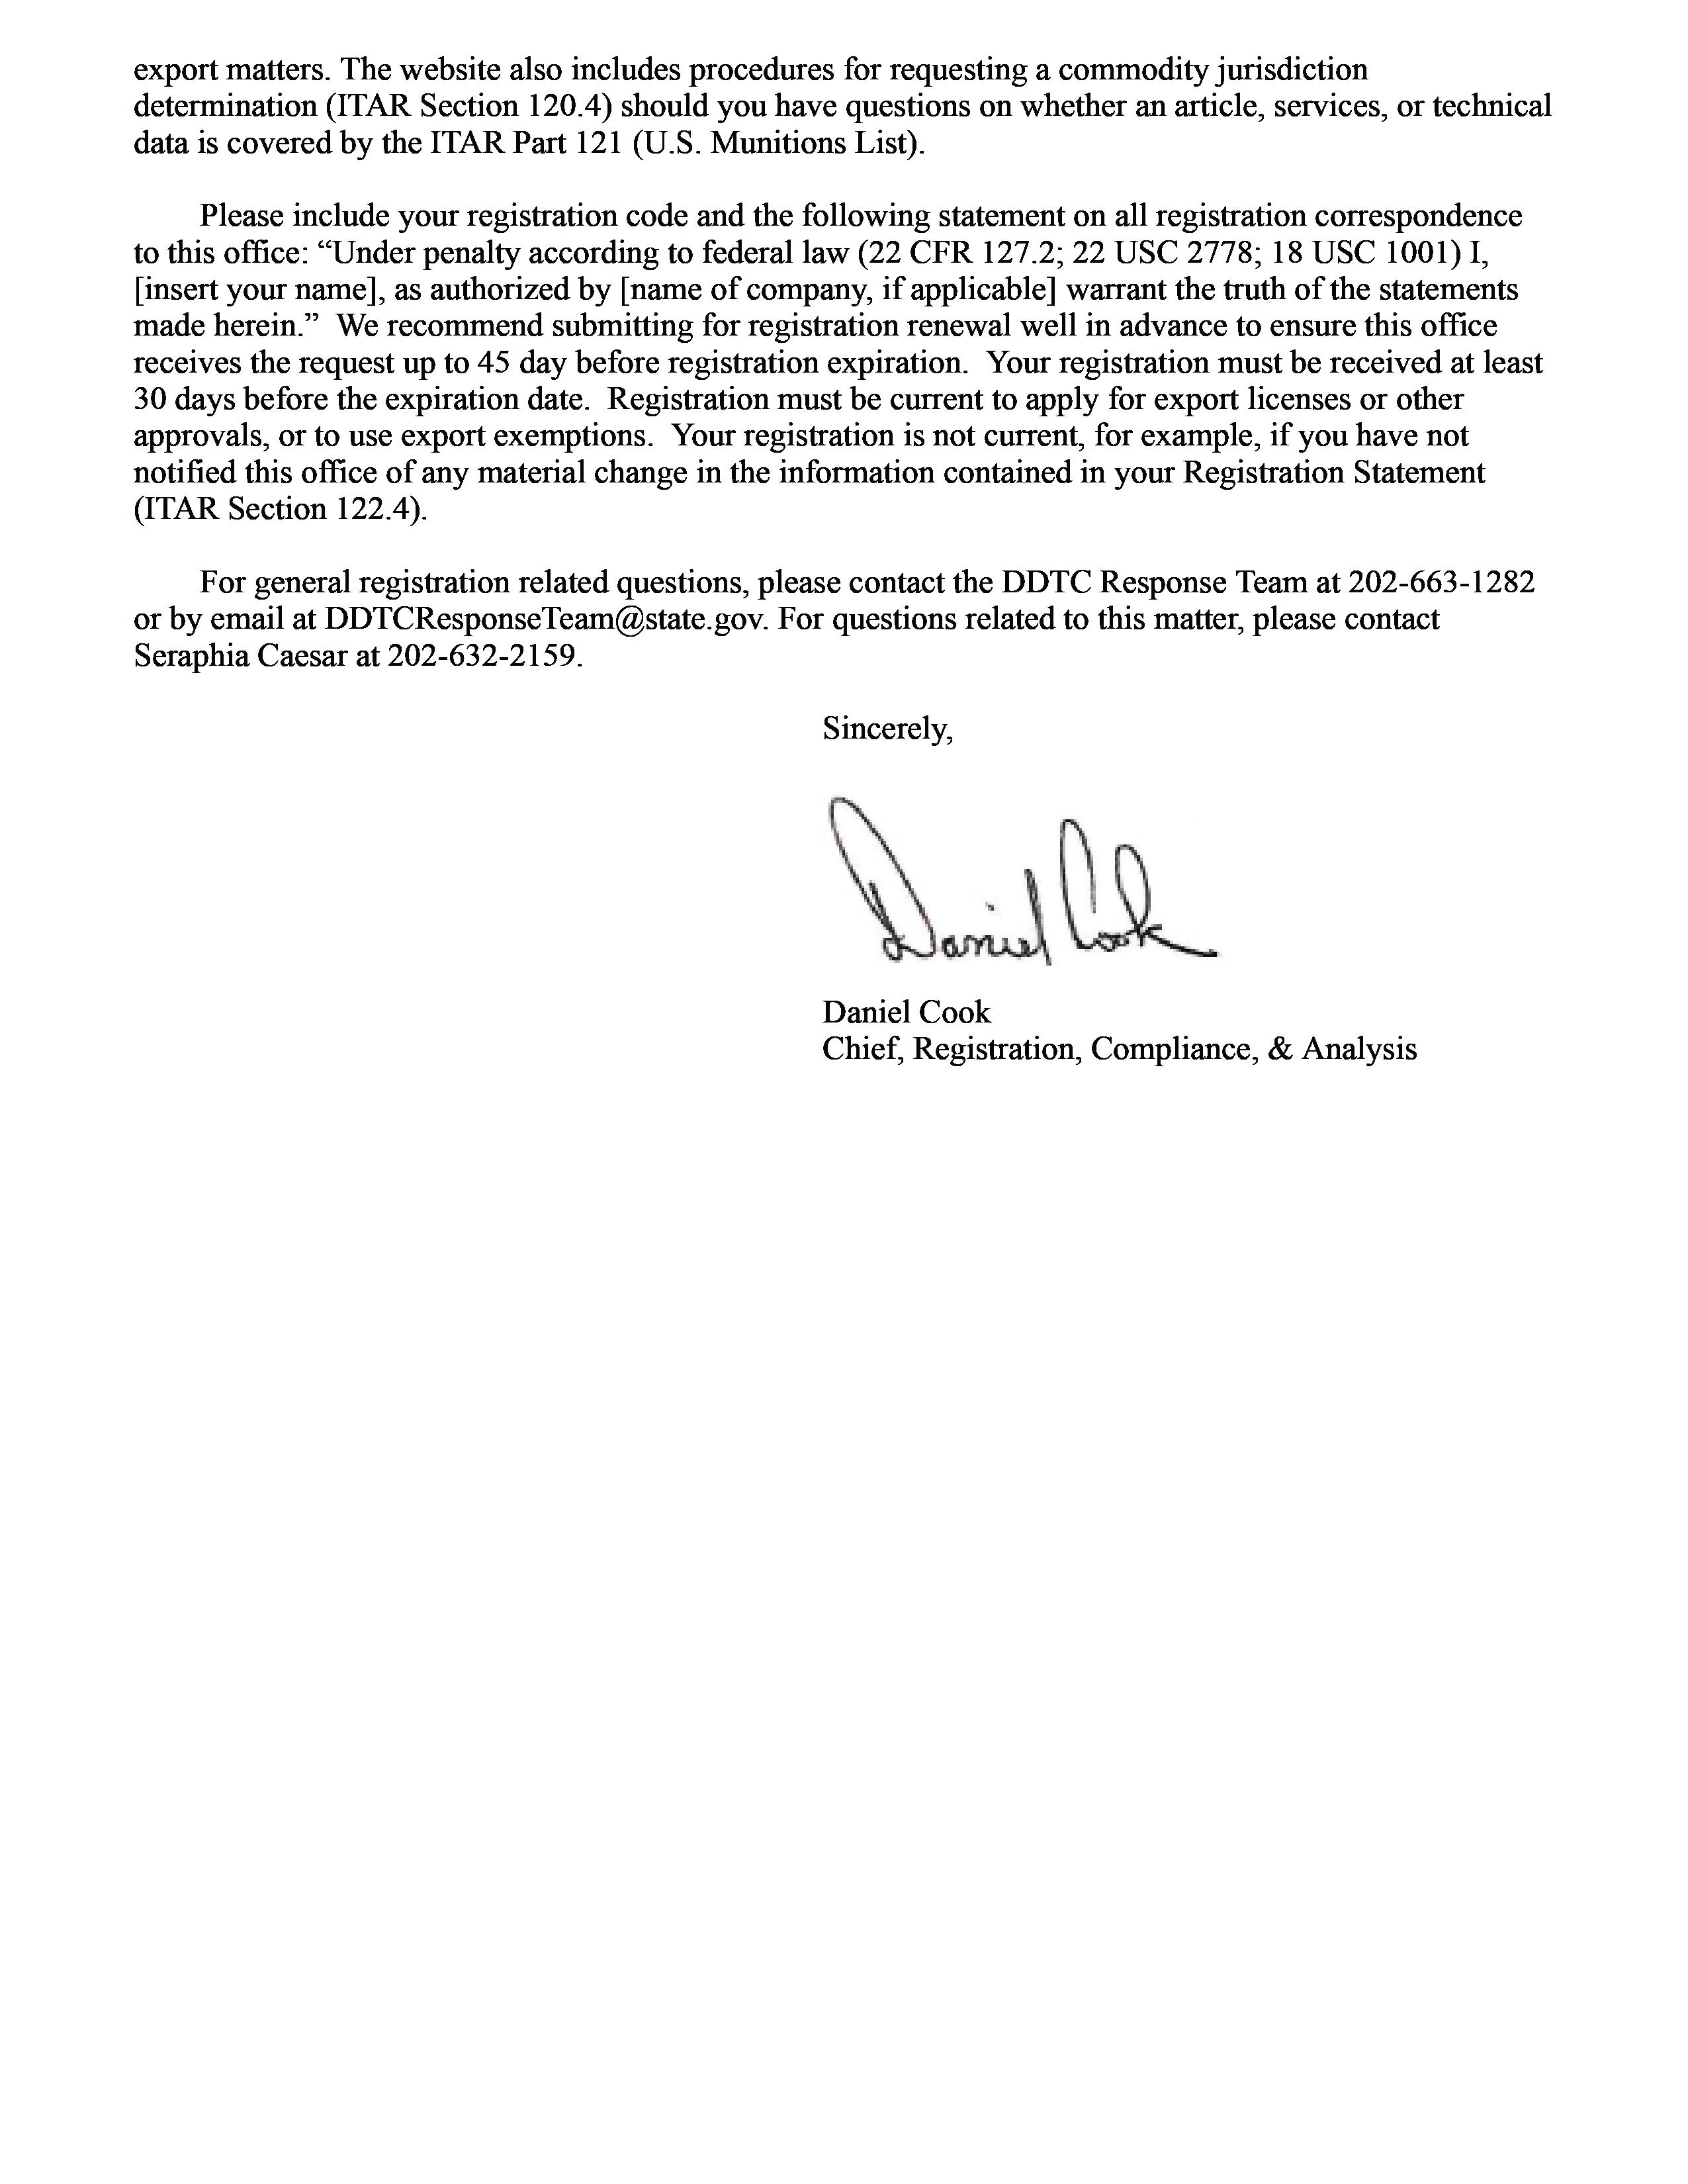 ITAR_Regulation_Letter_M39198-02